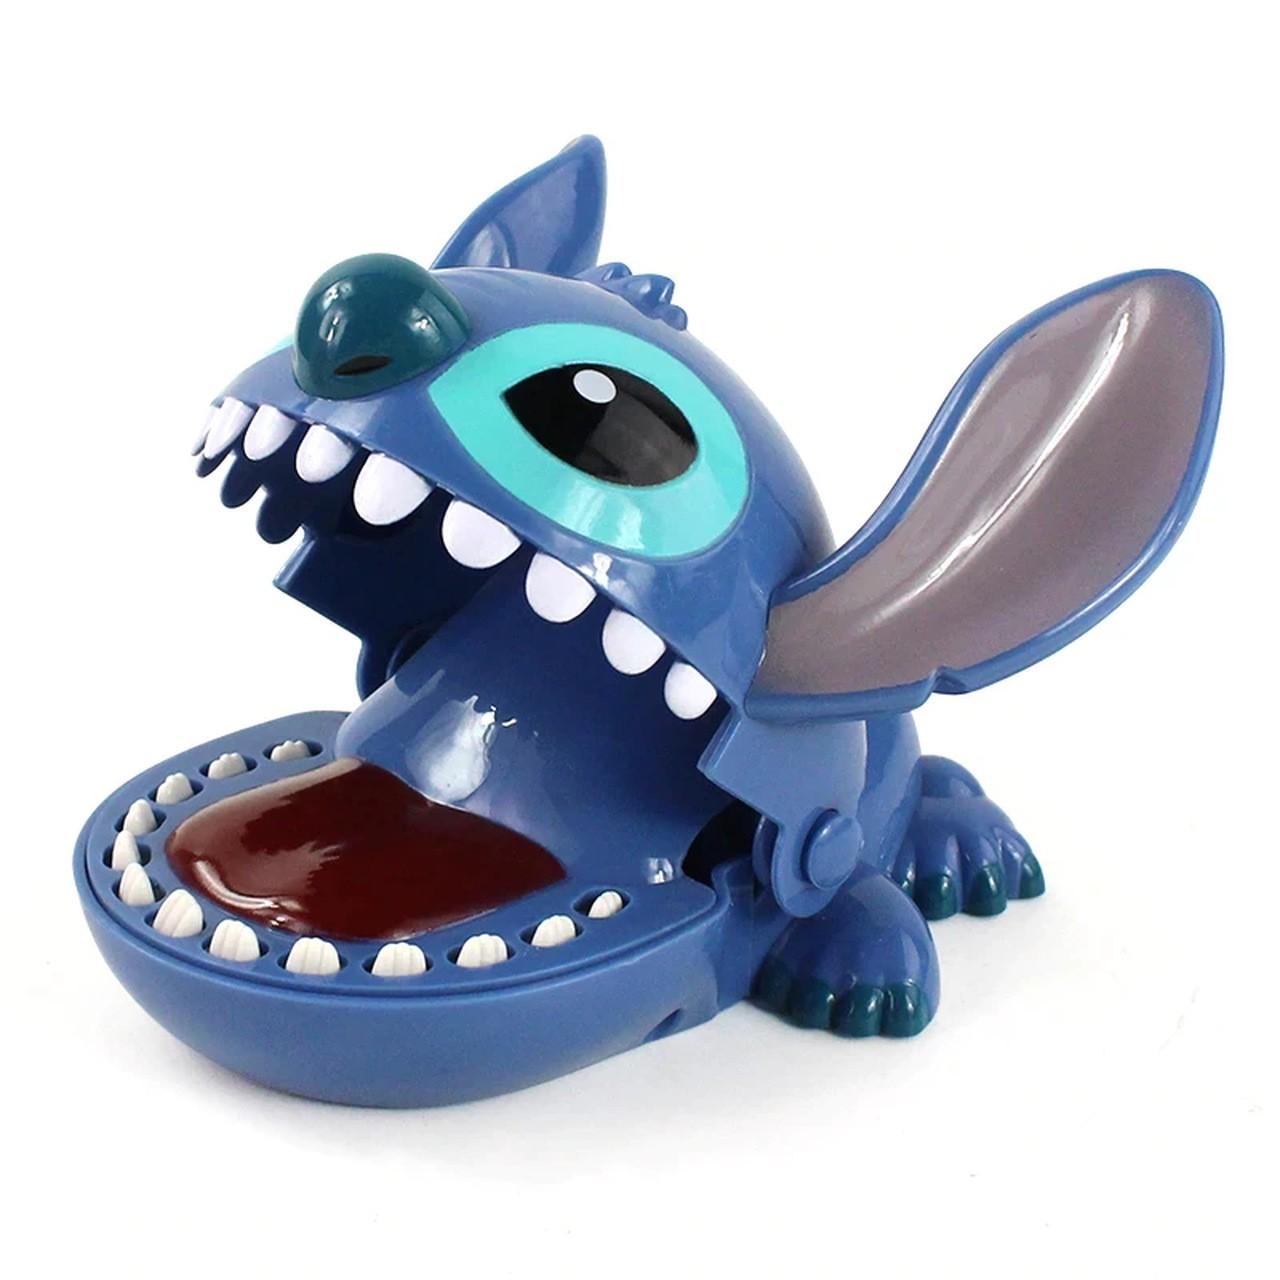 Brinquedo Jogo Crocodilo Dentista Stitch: Lilo & Stitch - Disney - ET